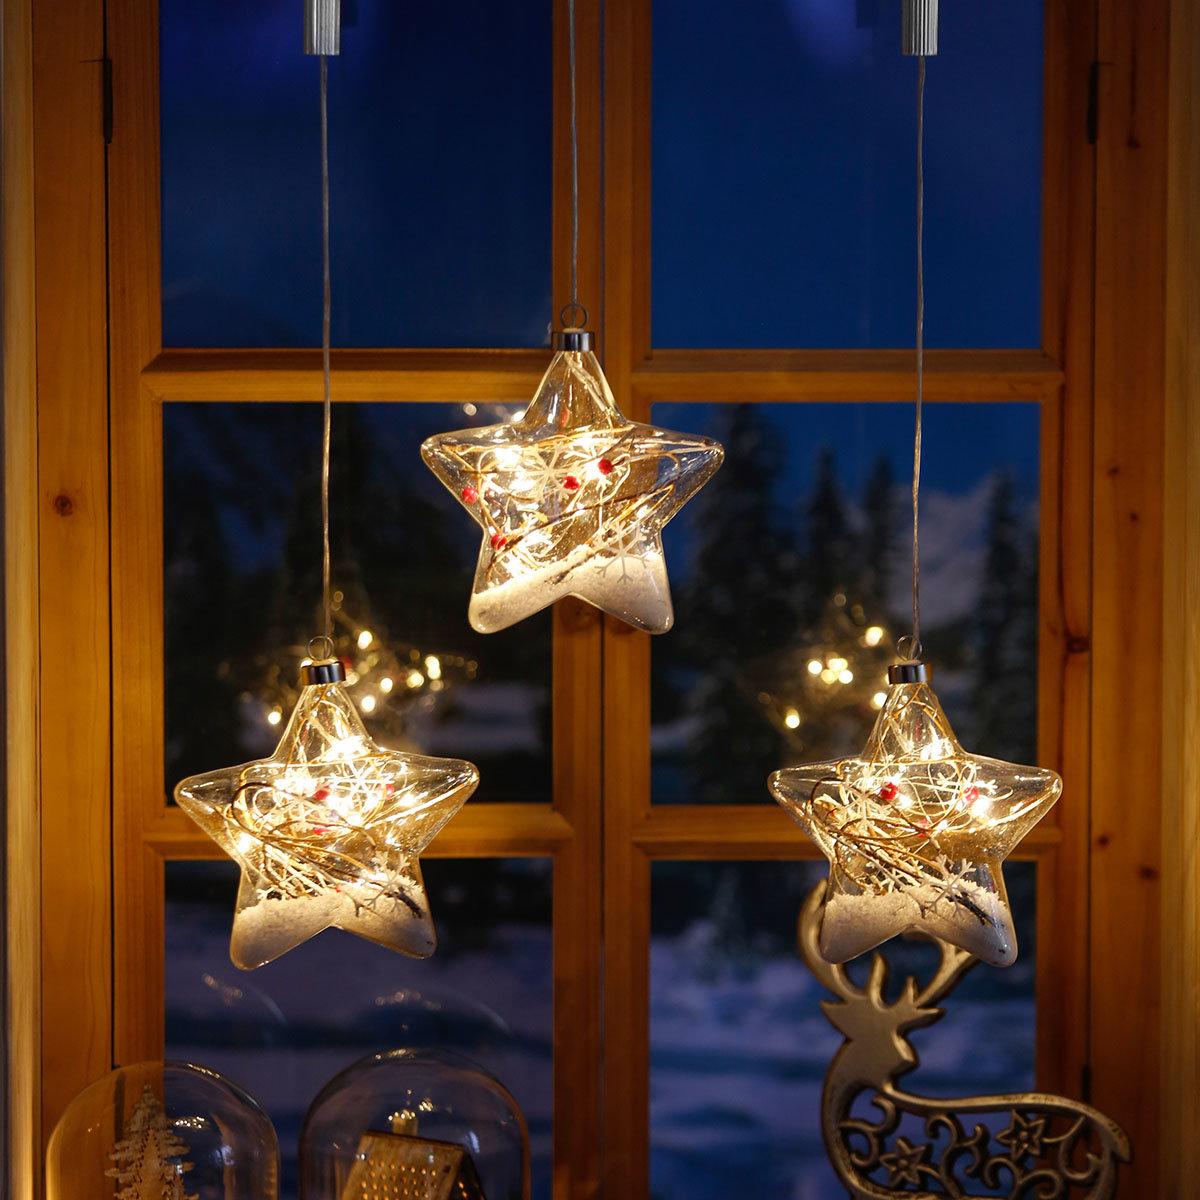 Inspirationen Led Sonnenschirm Beleuchtung Rawyler S 2018: LED-Fensterdeko Schneestern, 3er-Set Online Kaufen Bei